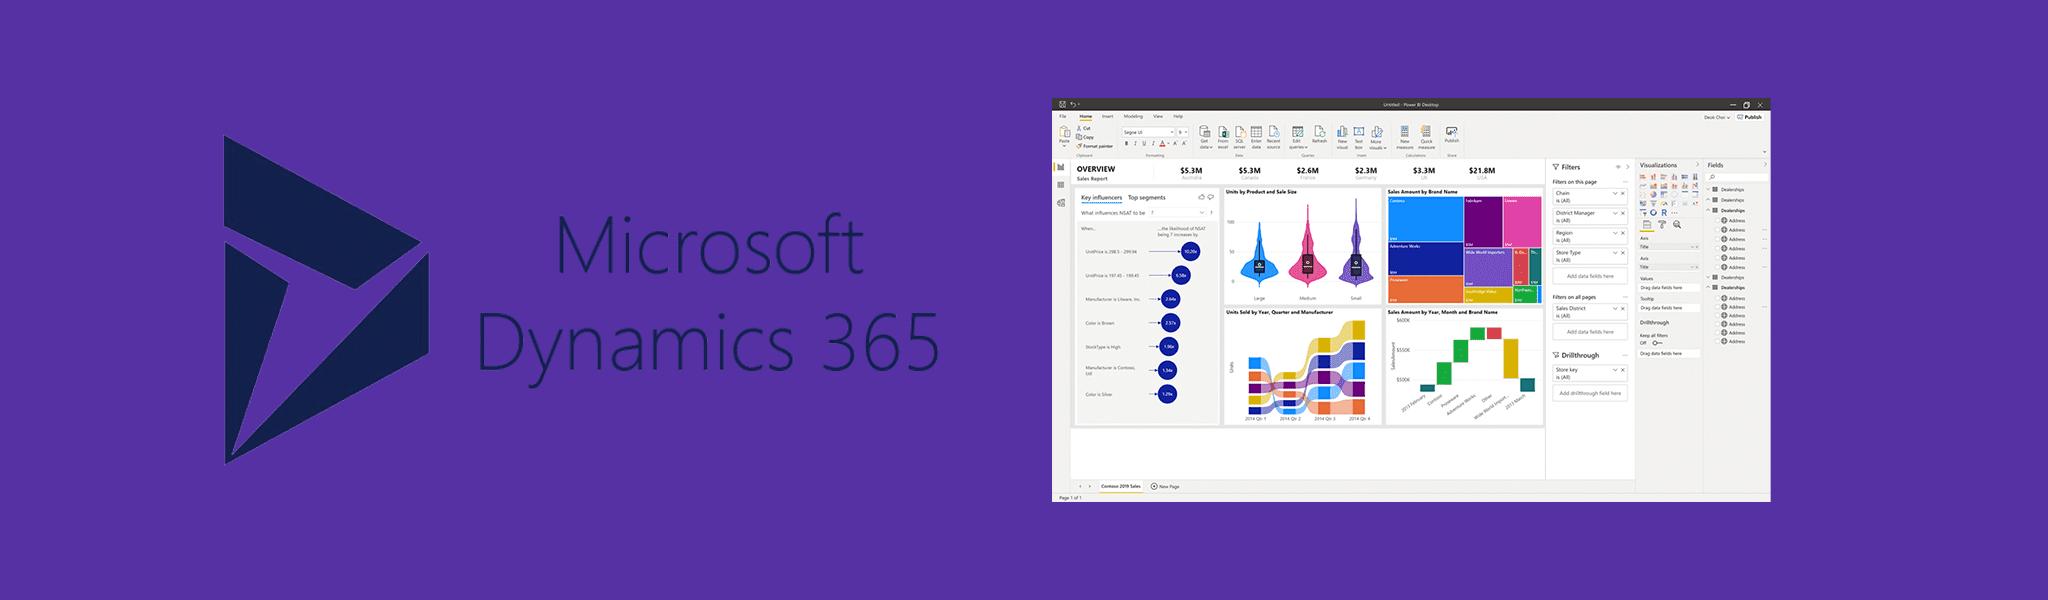 Microsoft-Dynamics365-Venta-Suscripciones-México